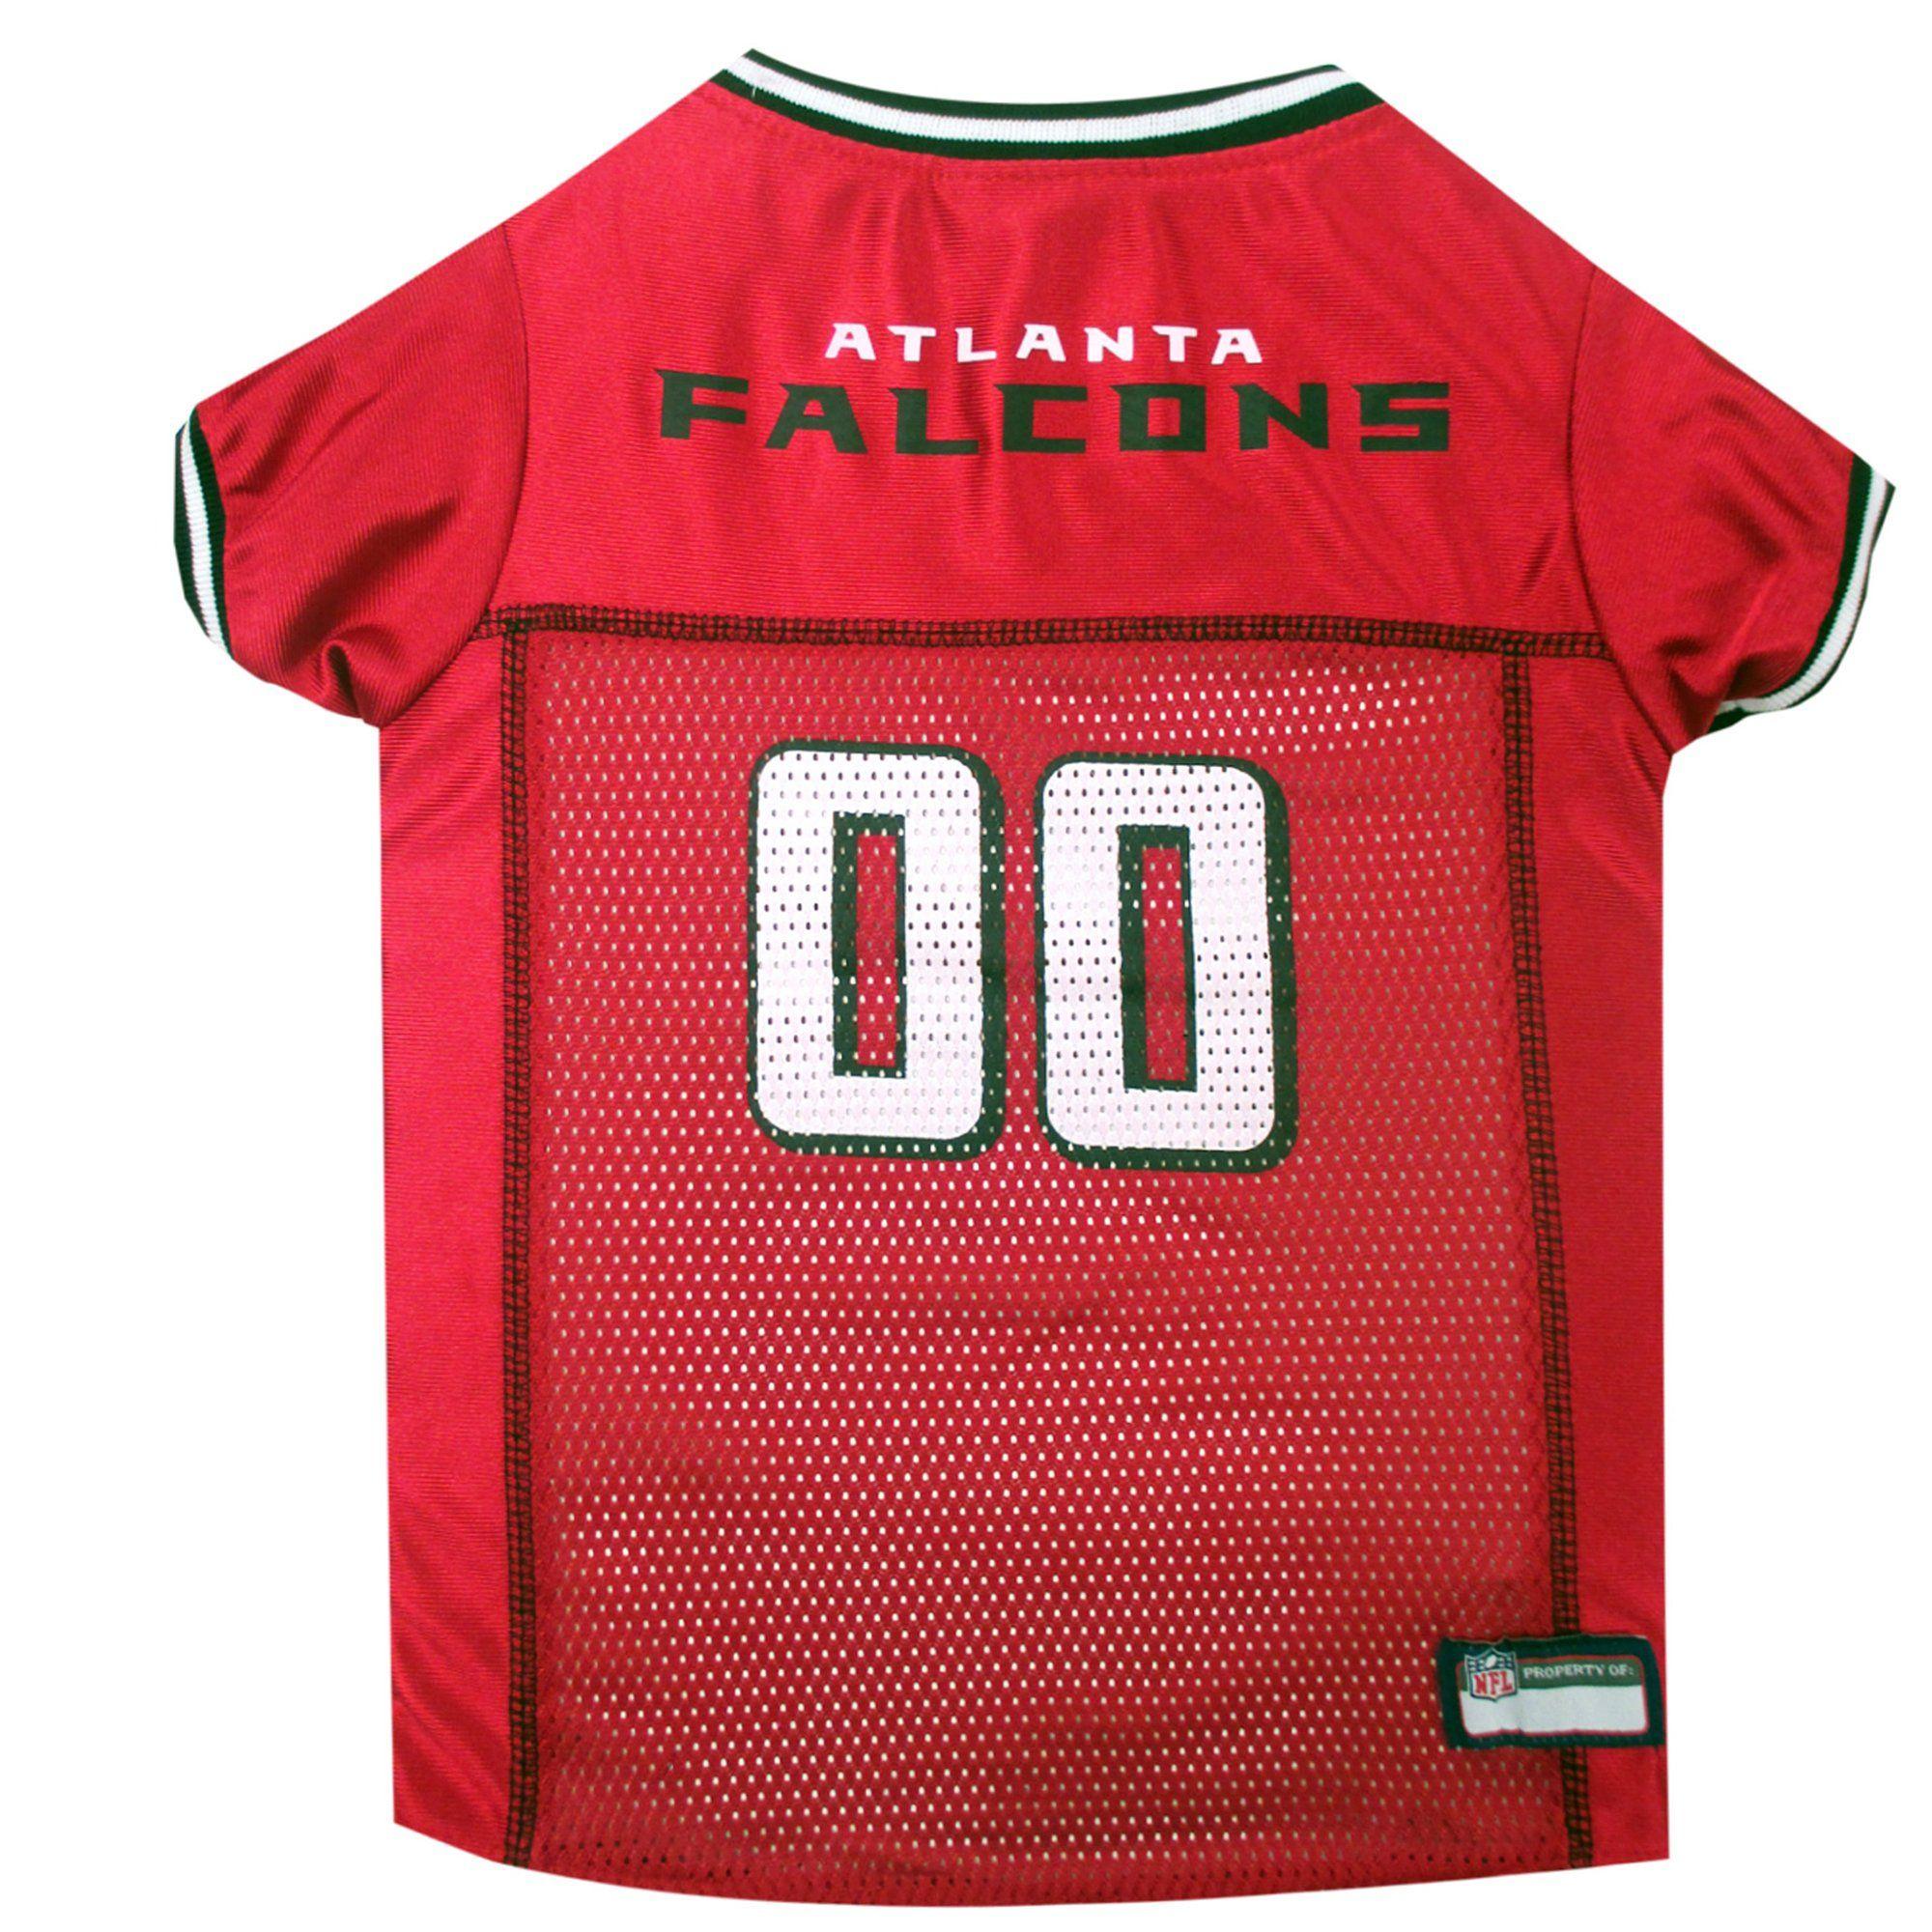 the best attitude e28ac 5e4cb Pets First Atlanta Falcons NFL Mesh Pet Jersey, X-Small ...